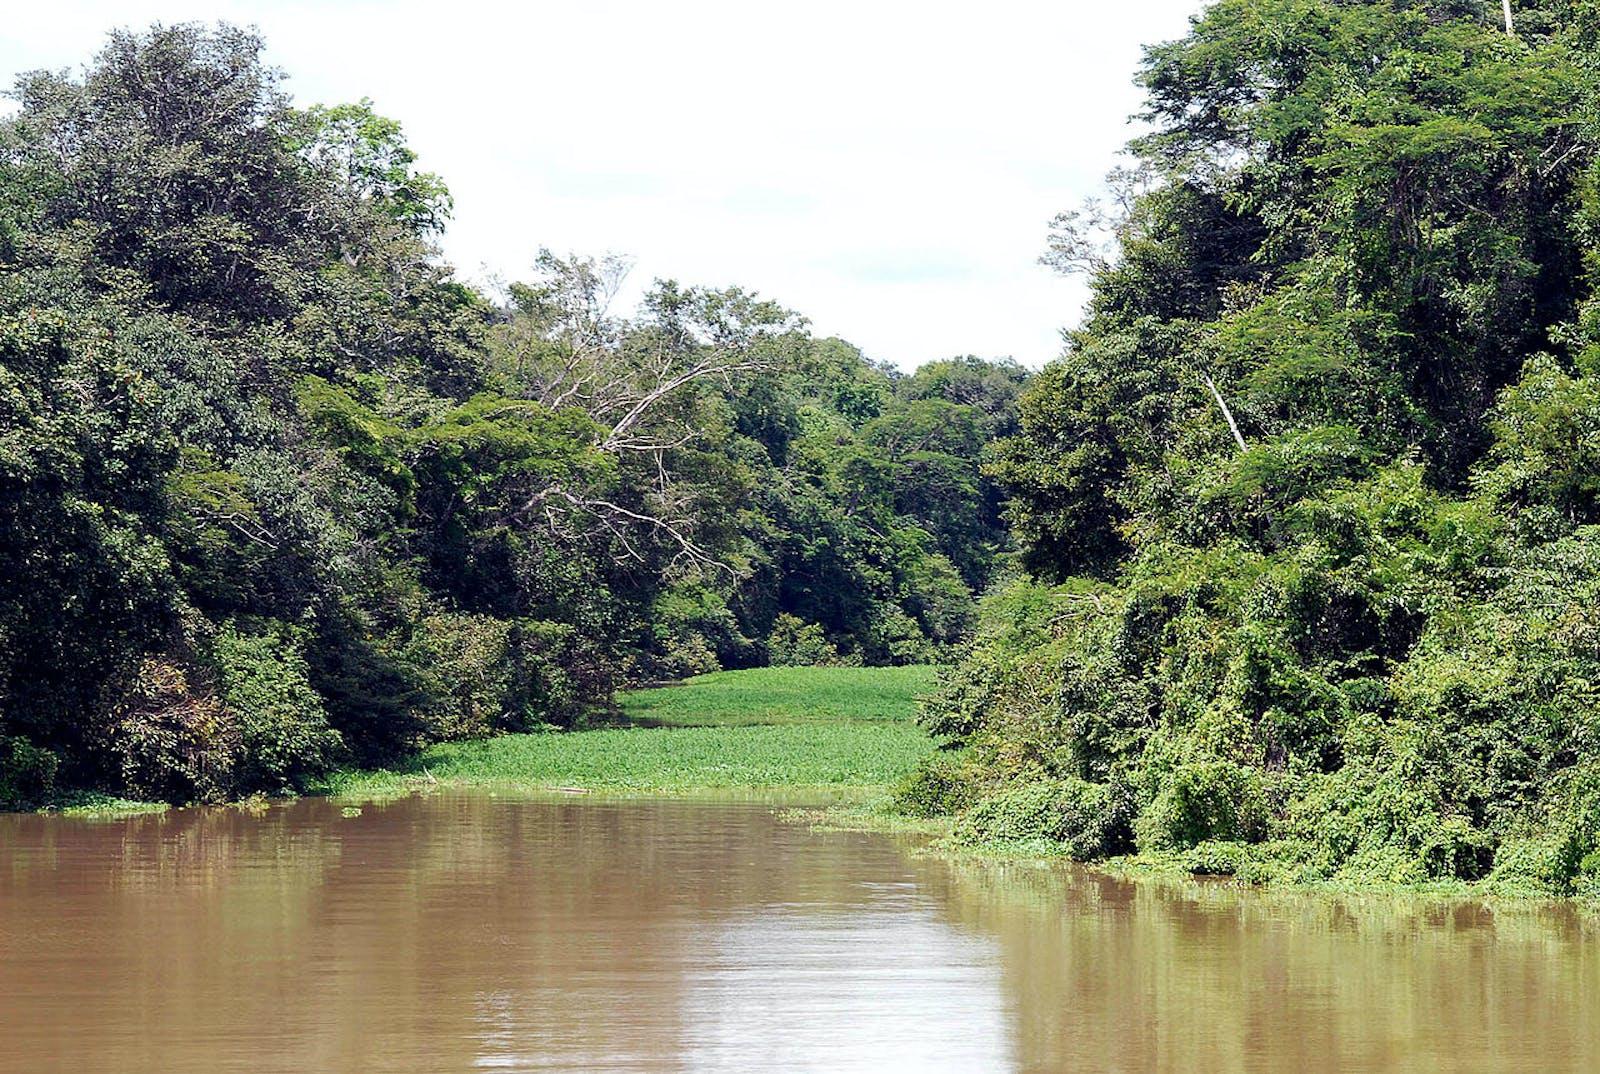 Juruá-Purus Moist Forests